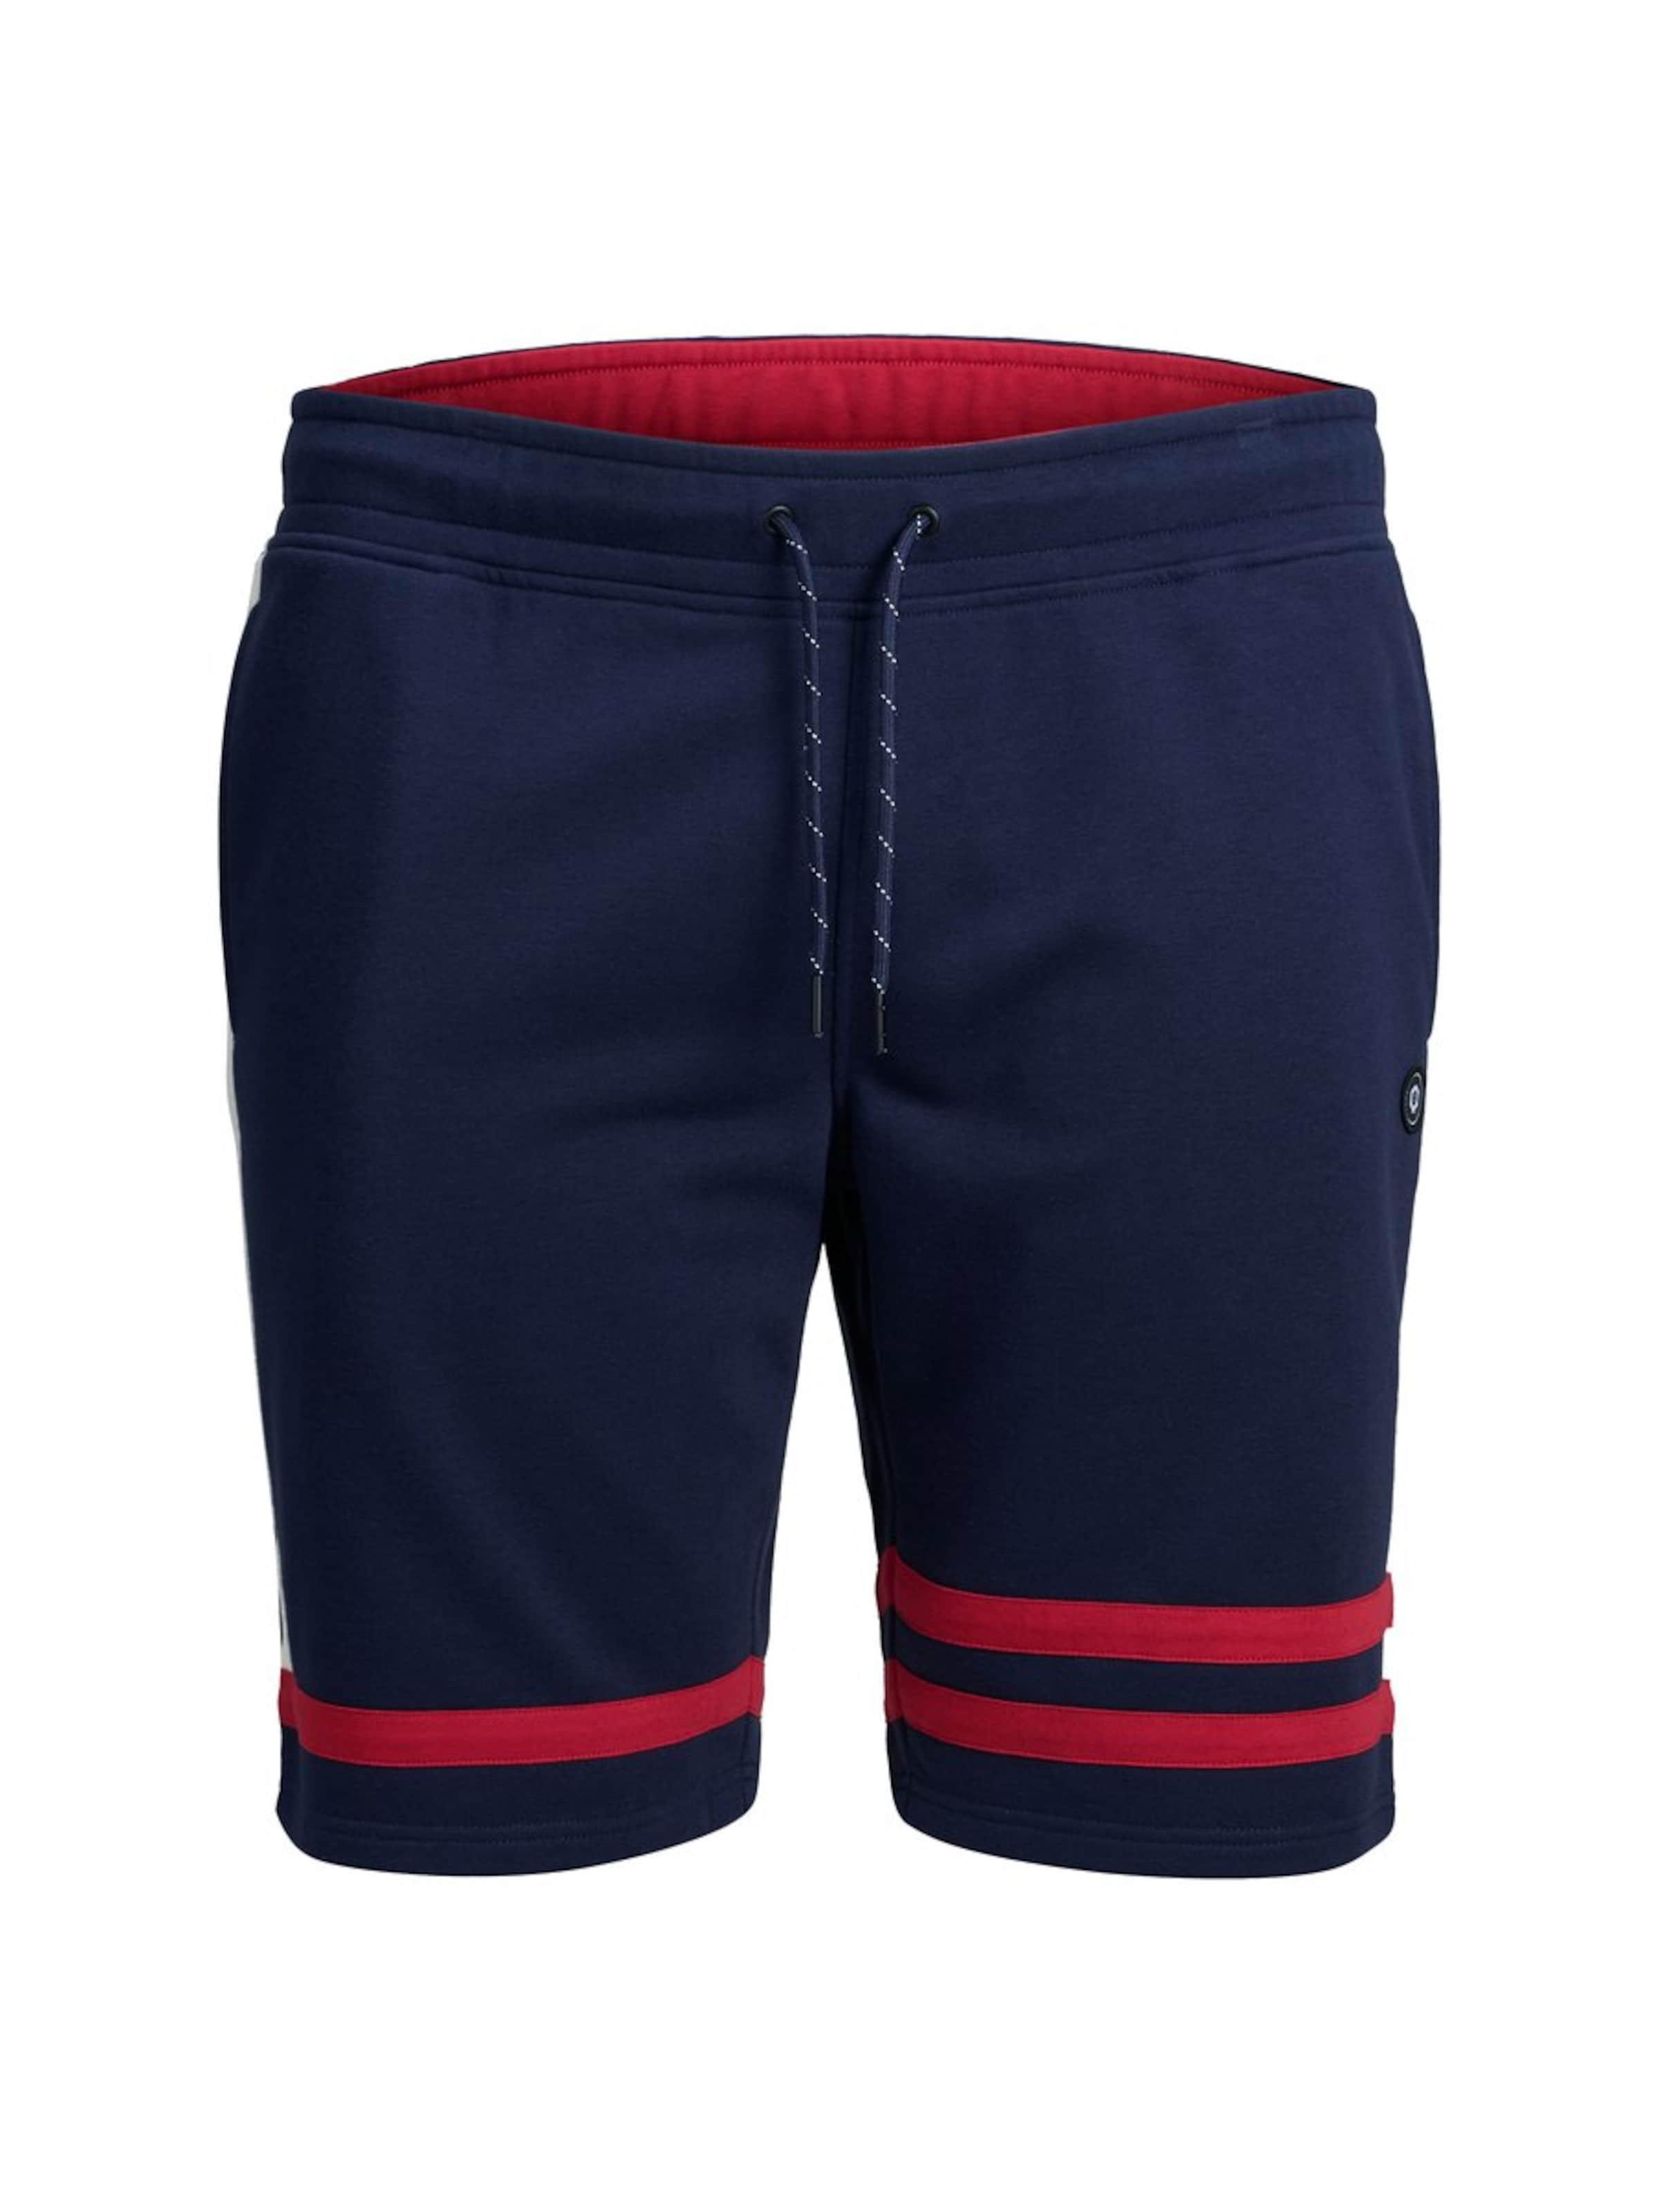 In Weiß Jones NavyFeuerrot Shorts Jackamp; vmONnw08